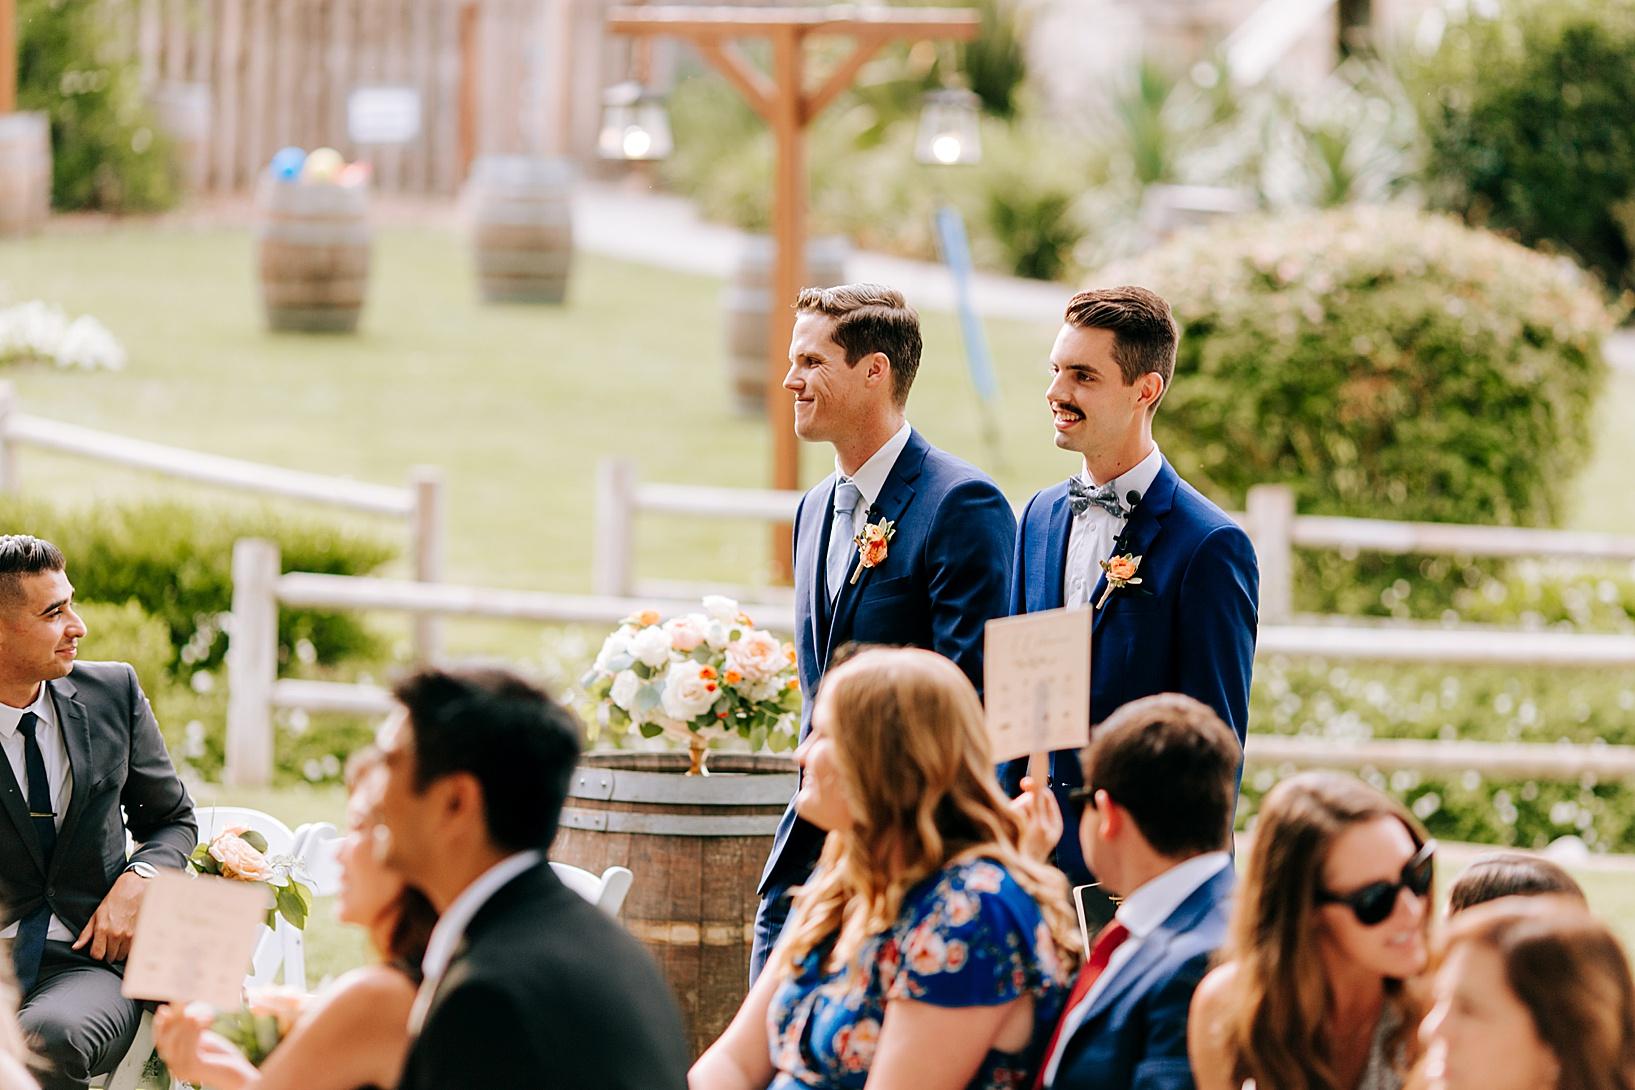 Ceremony Details for Temecula wedding at Temecula Creek Inn